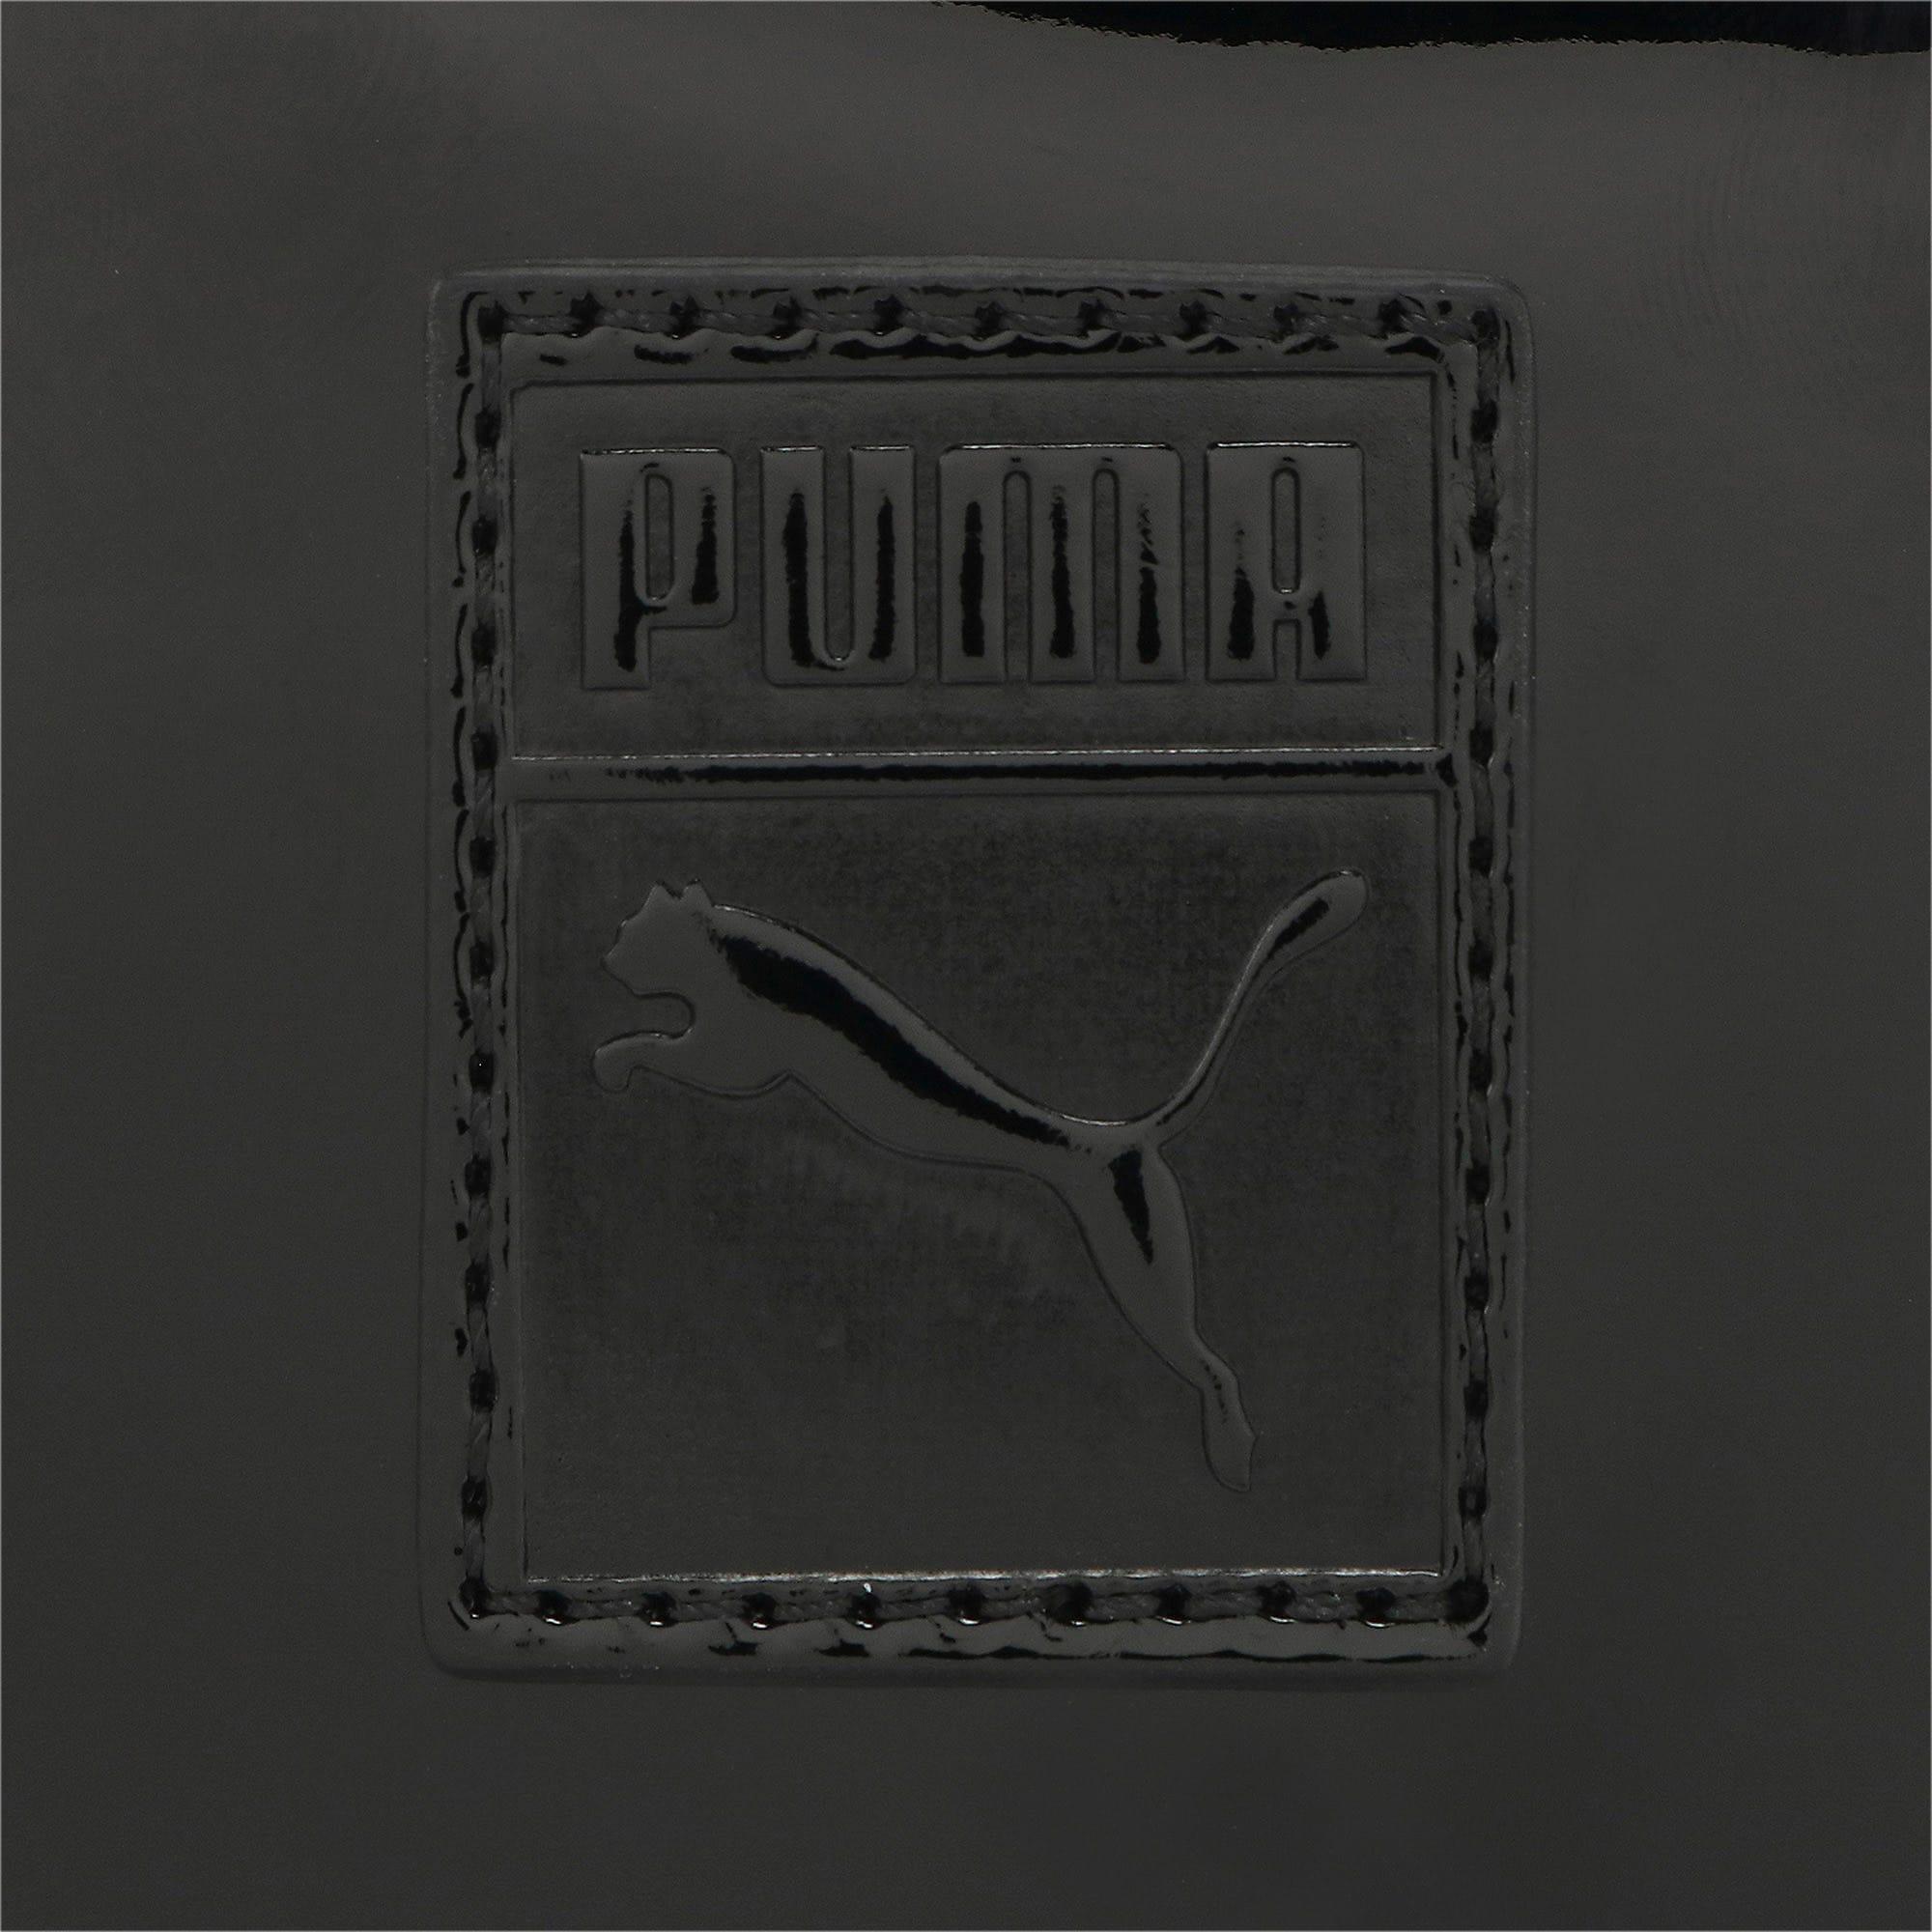 Thumbnail 5 of プライム プレミアム ウィメンズ アーカイブ バックパック 8L, Puma Black, medium-JPN